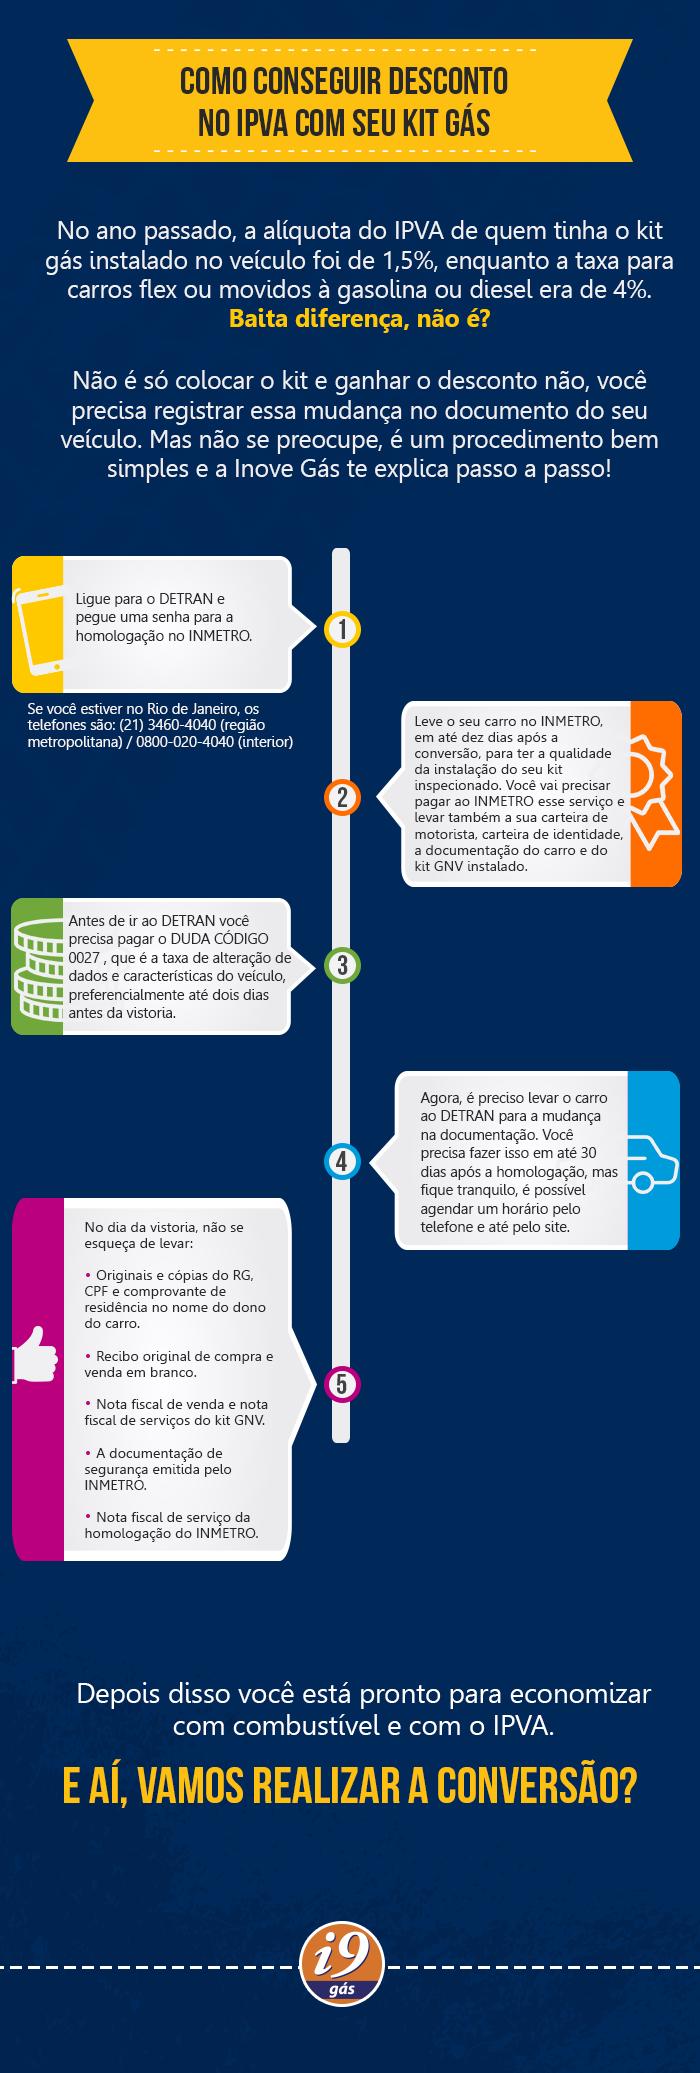 Infográfico: Como conseguir desconto no IPVA com seu kit gás?